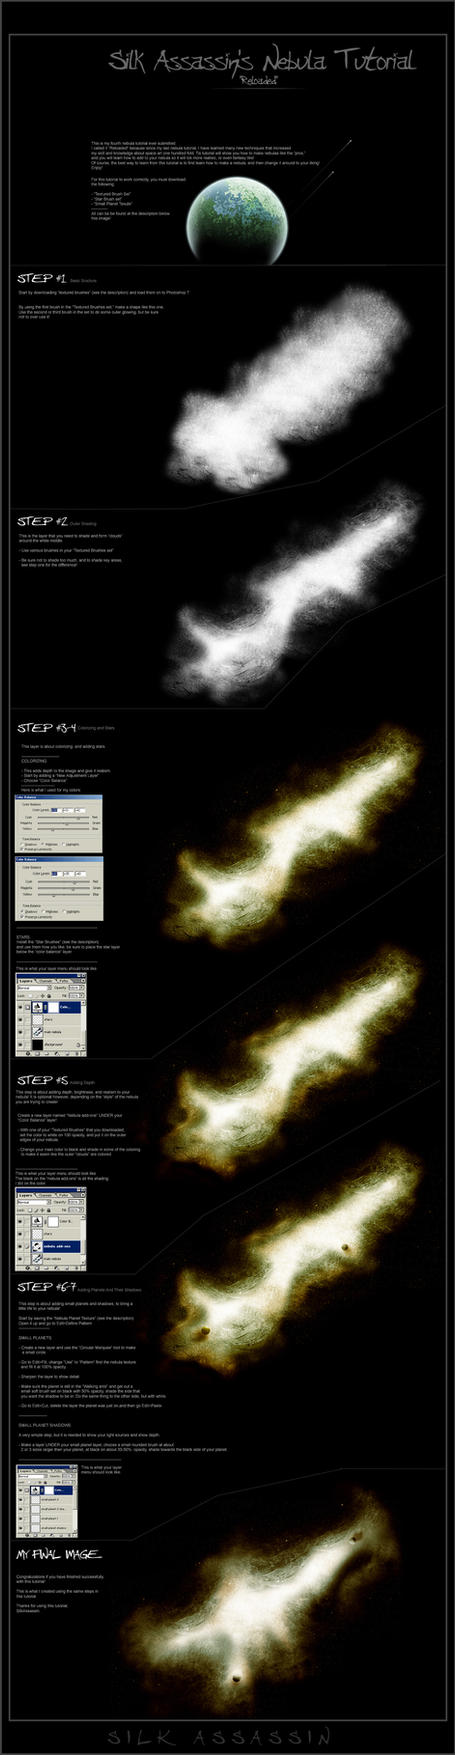 Nebula Tutorial, Re-Loaded. by SilkAssassin